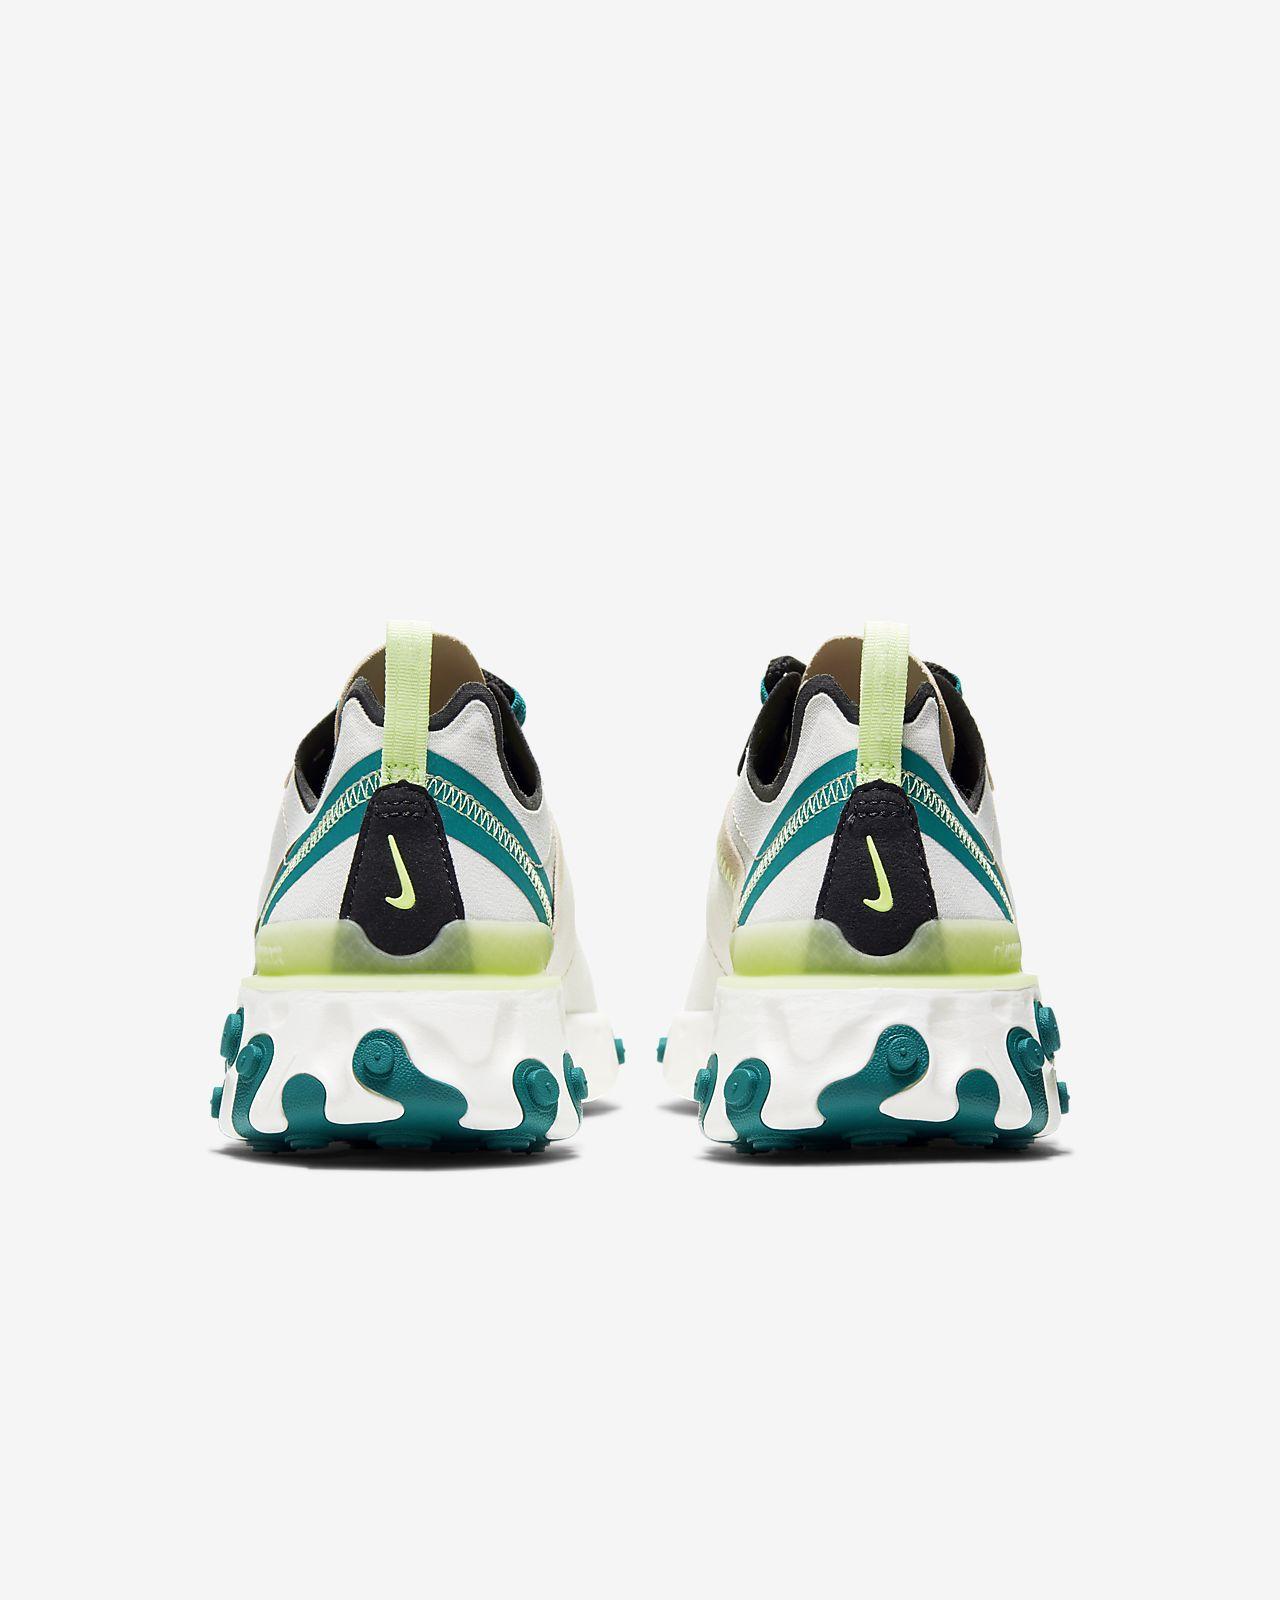 Baskets basses | Nike Homme Air max muri Gris Anthracite Foncé — CJ Oilfield